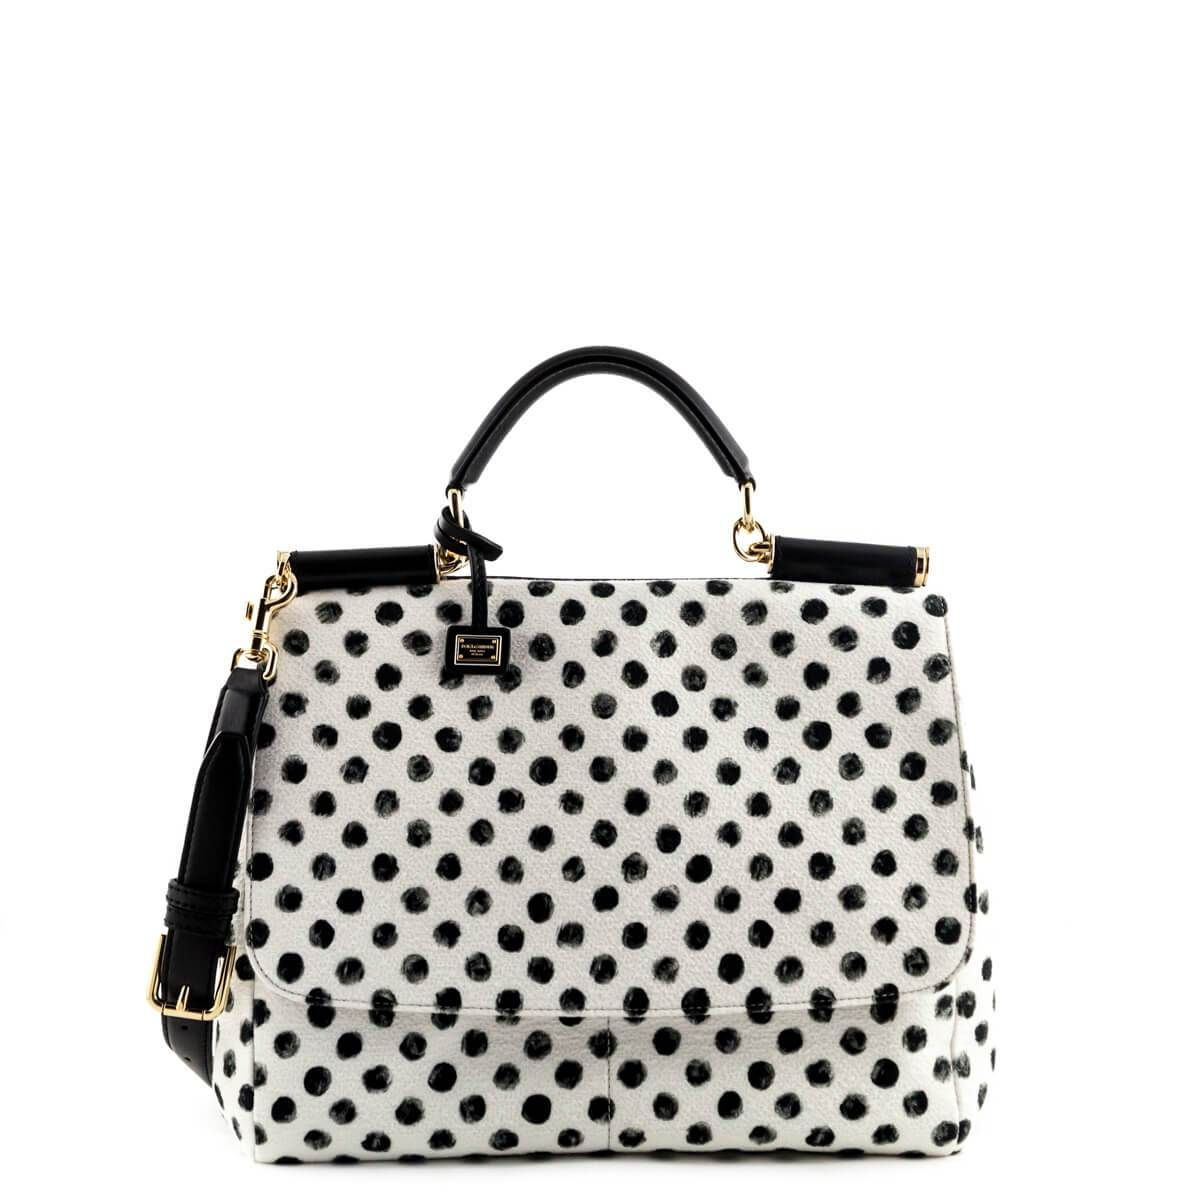 bac0324e46ae Dolce   Gabbana Polka Dot Miss Sicily Bag -  1125 CAD